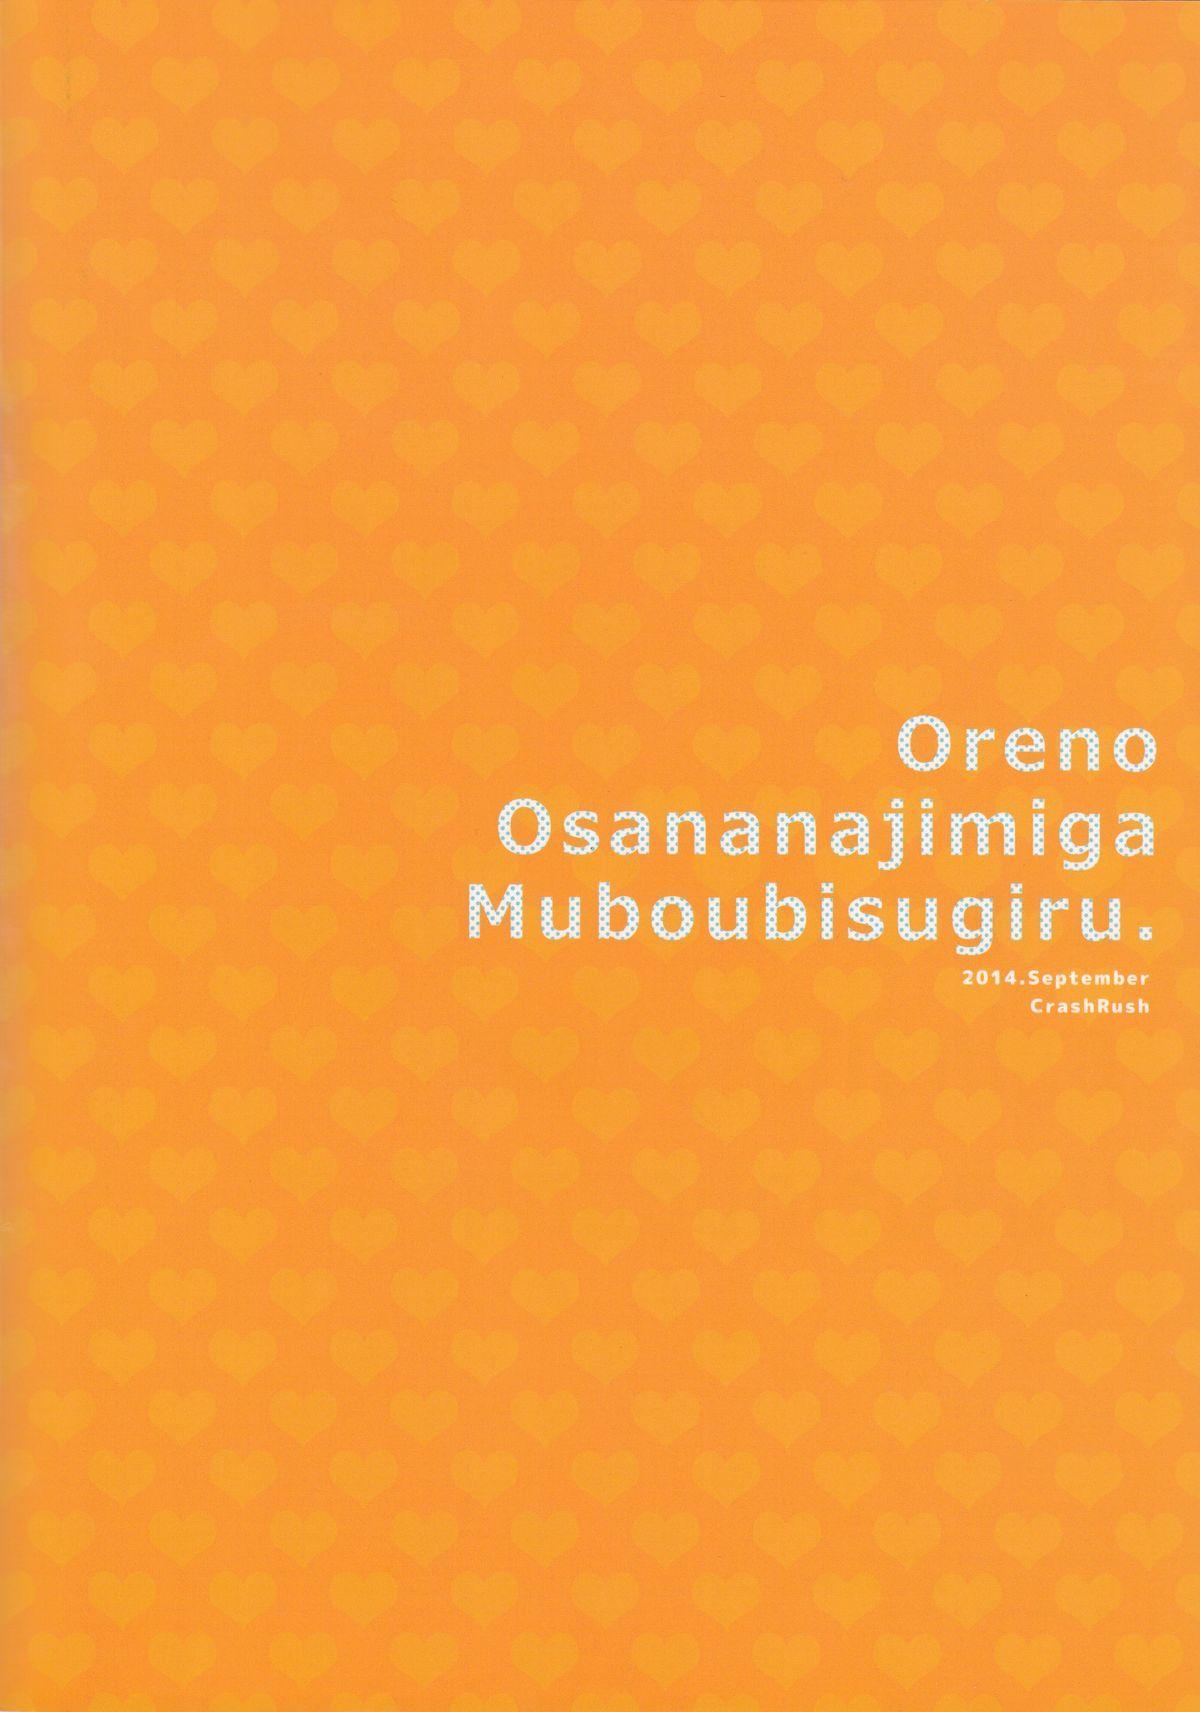 Ore no Osananajimi ga Muboubi Sugiru. 28